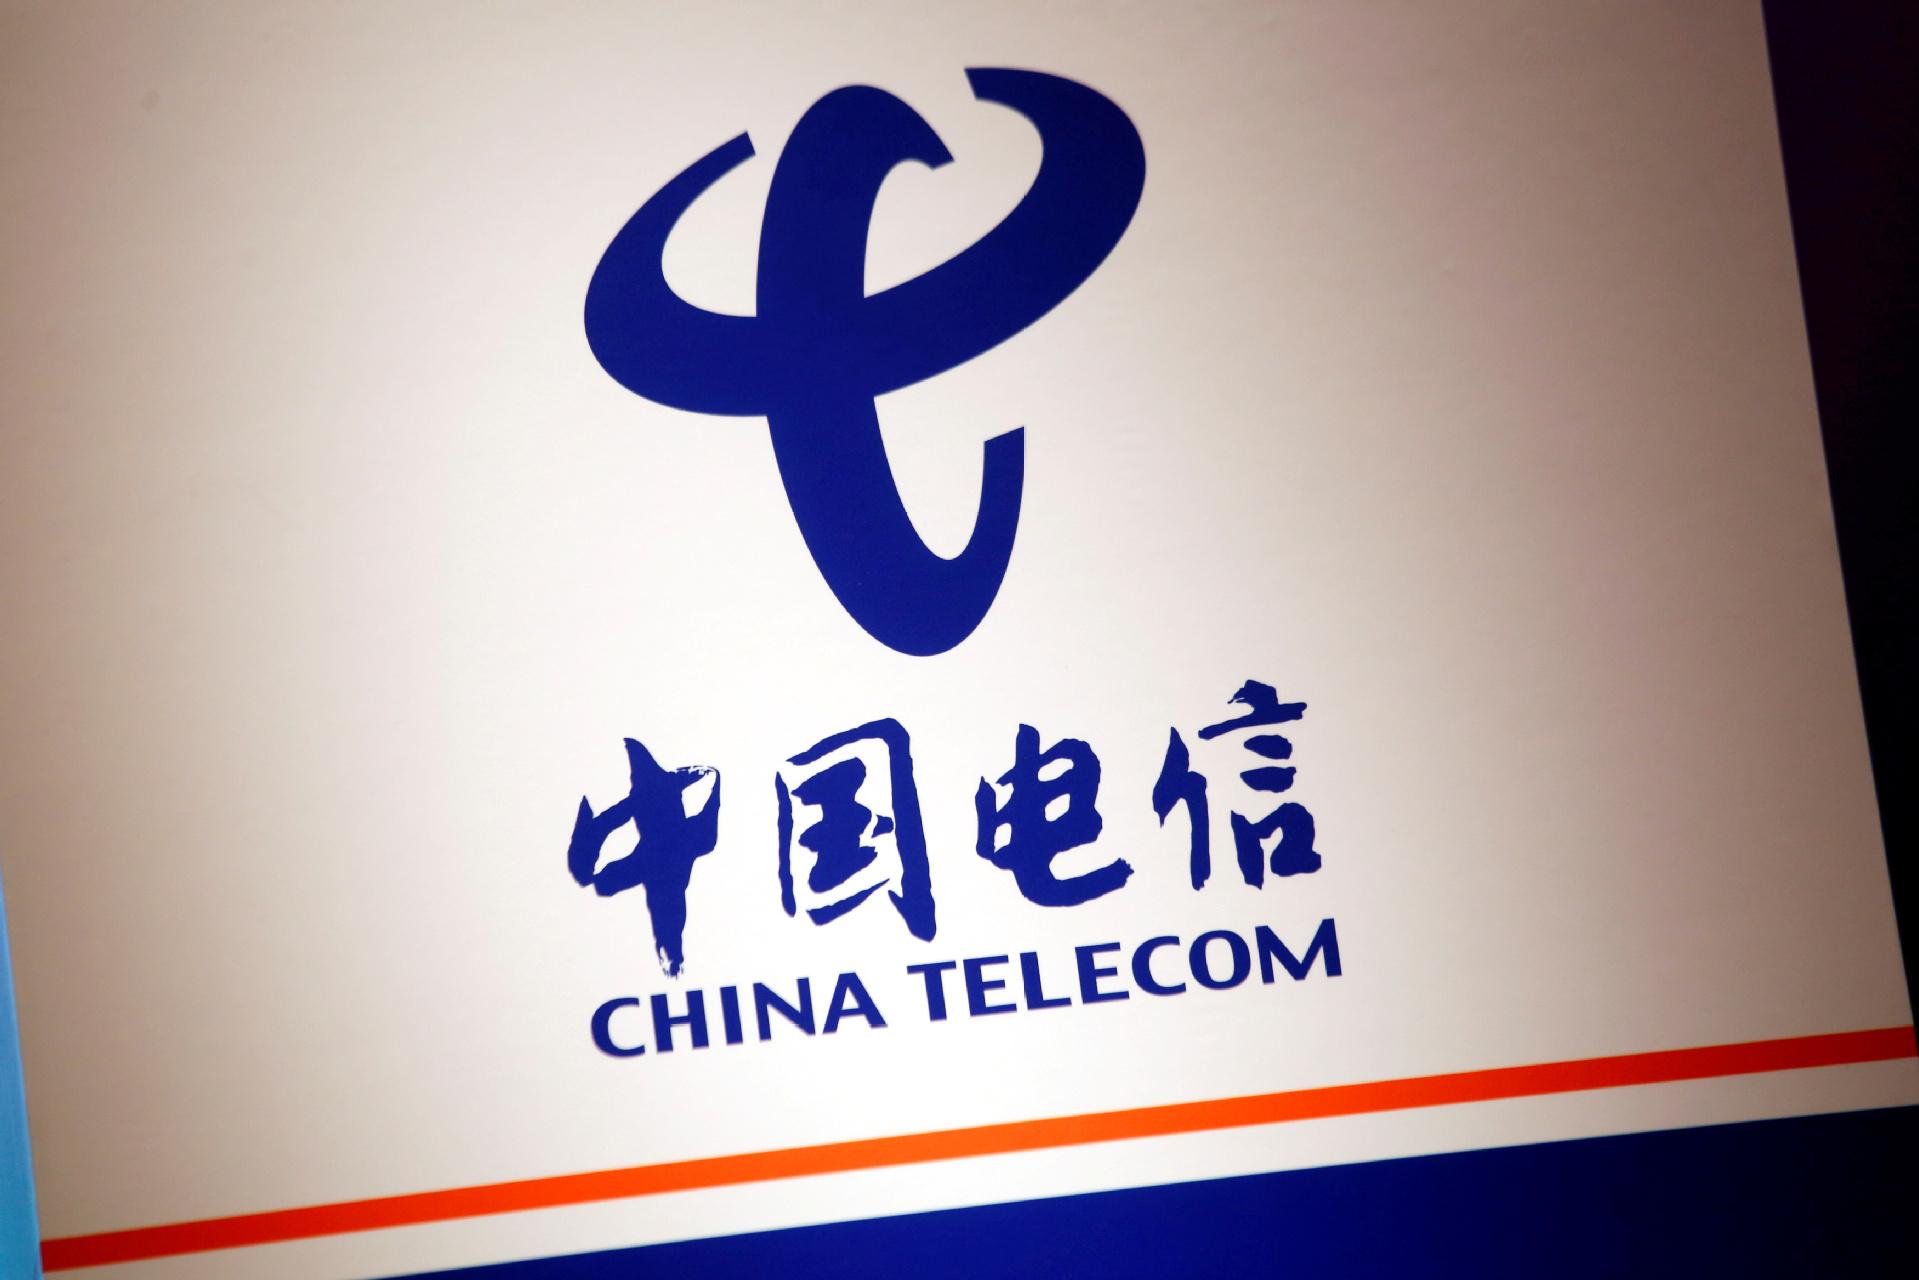 China Telecom posts higher profits, revenues in 2020